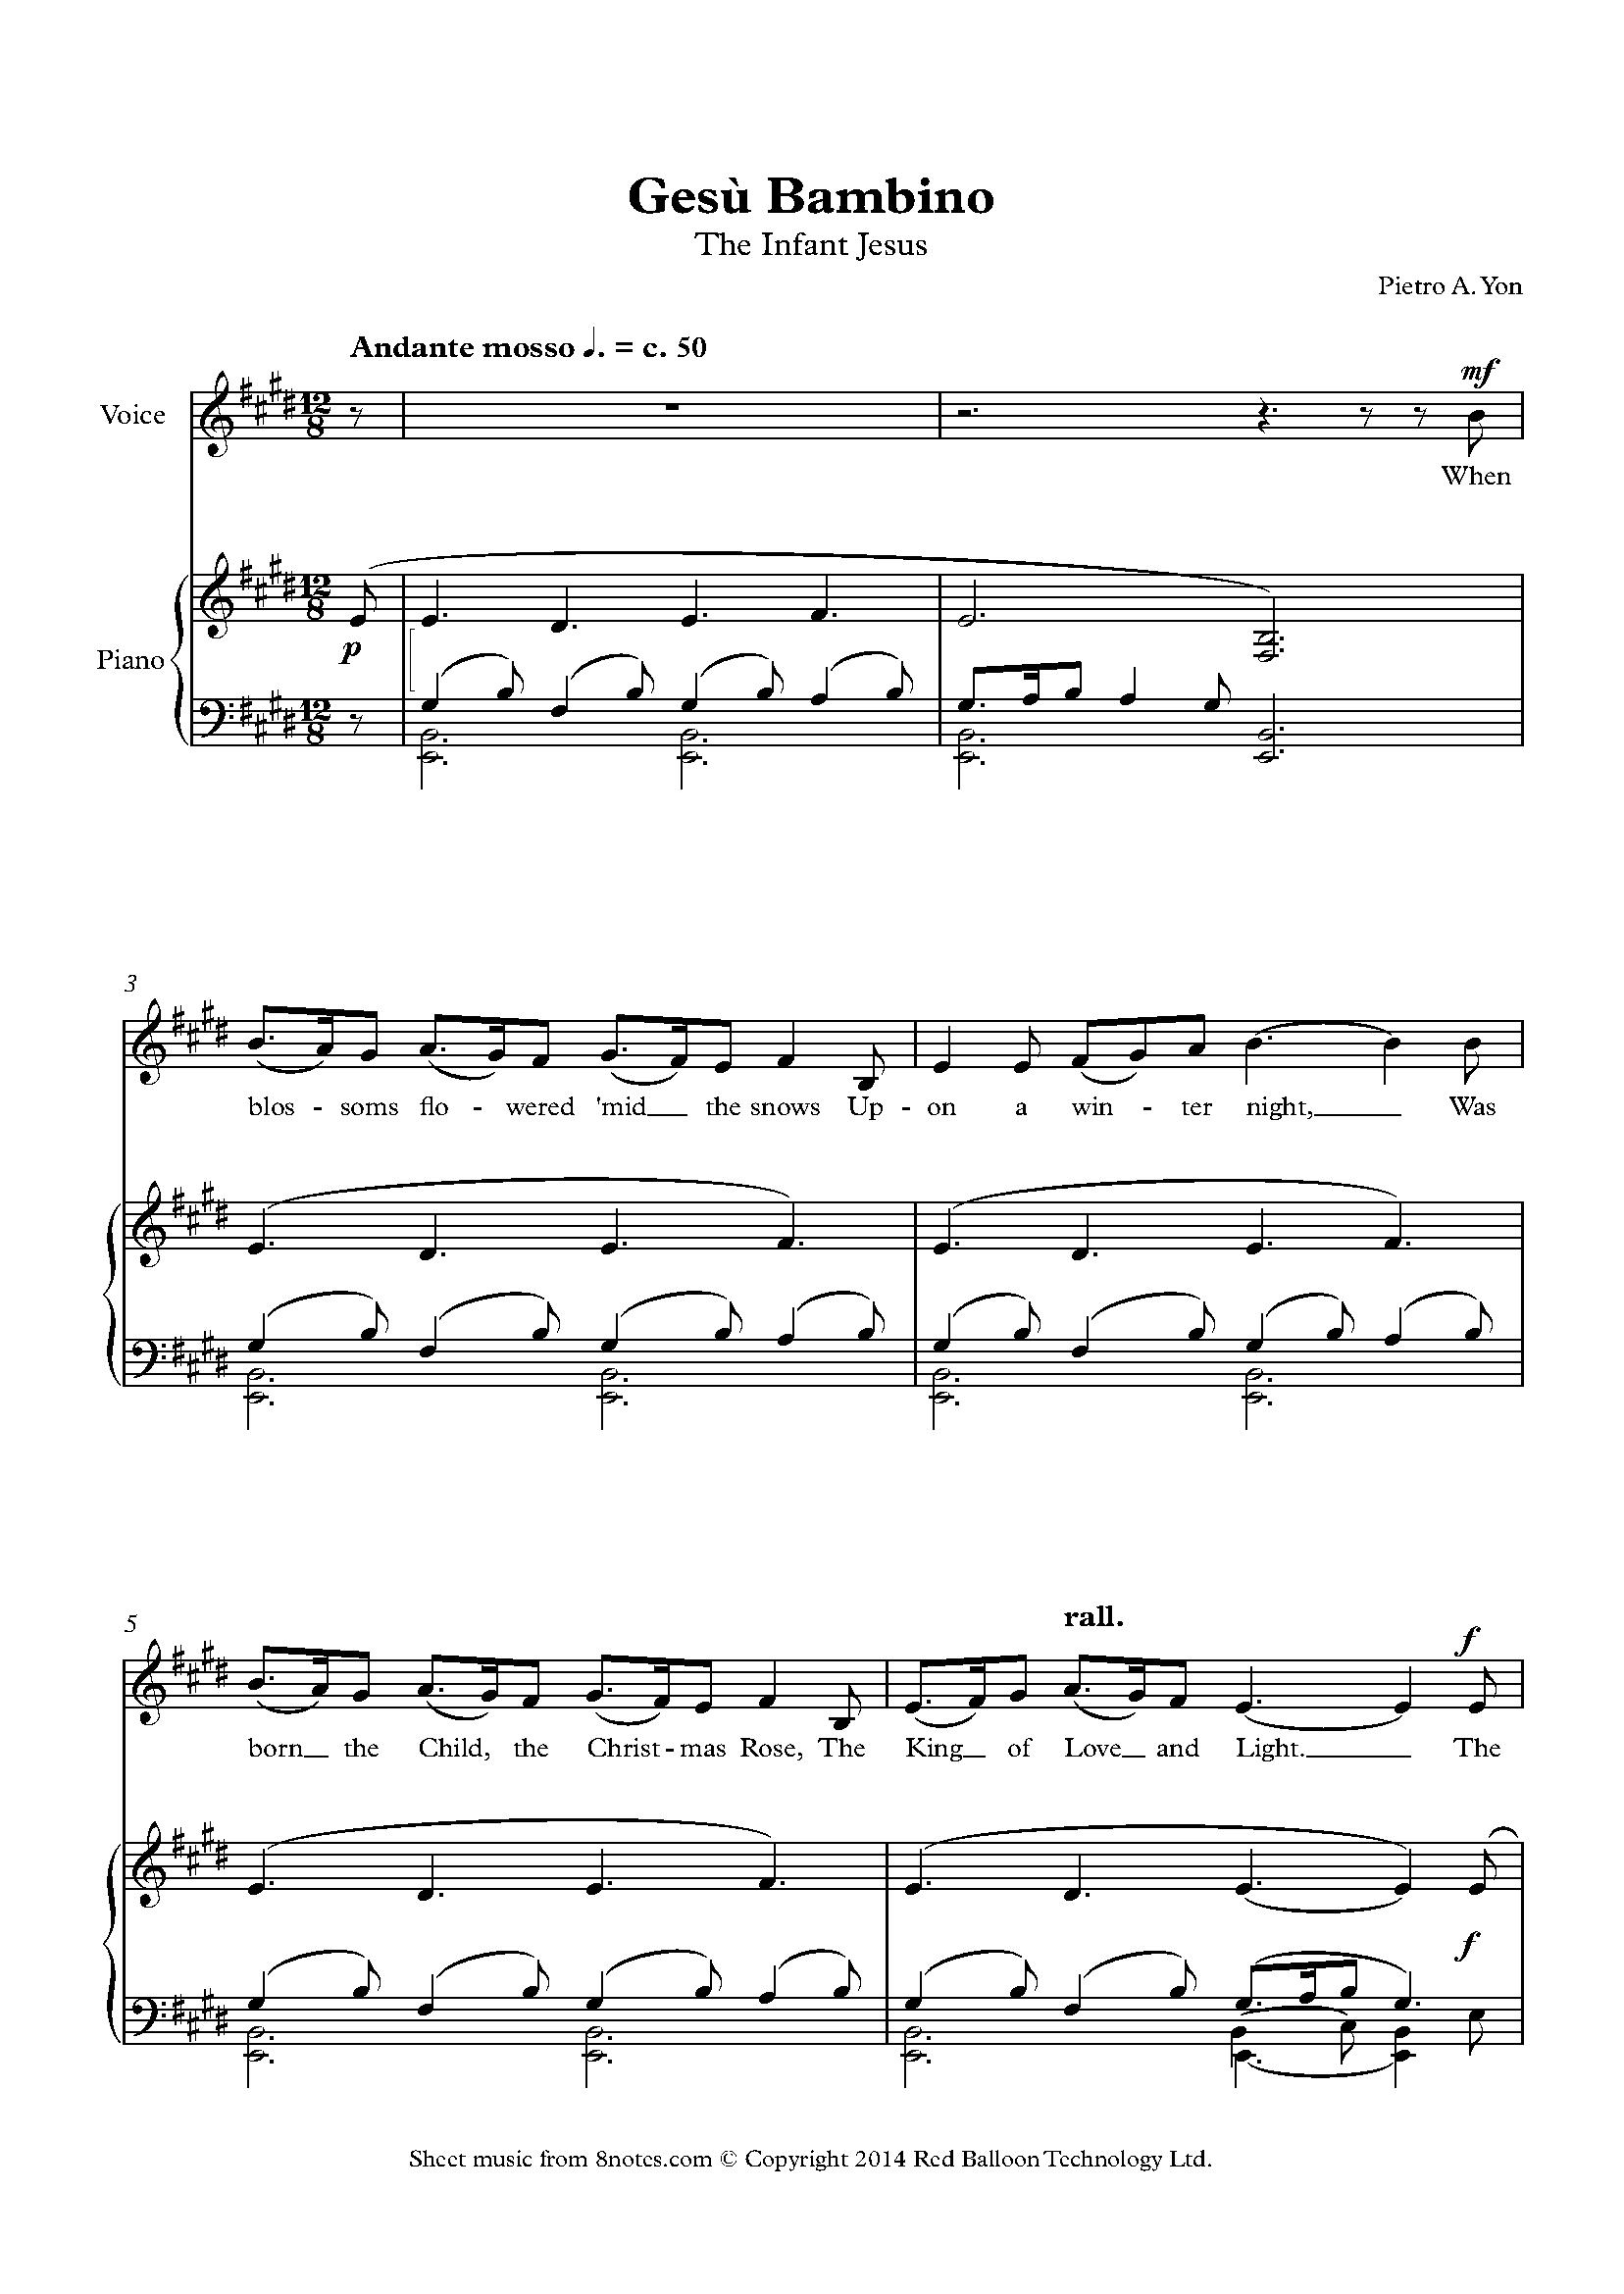 yon pietro - gesu bambino (the infant jesus) sheet music for voice -  8notes.com  8notes